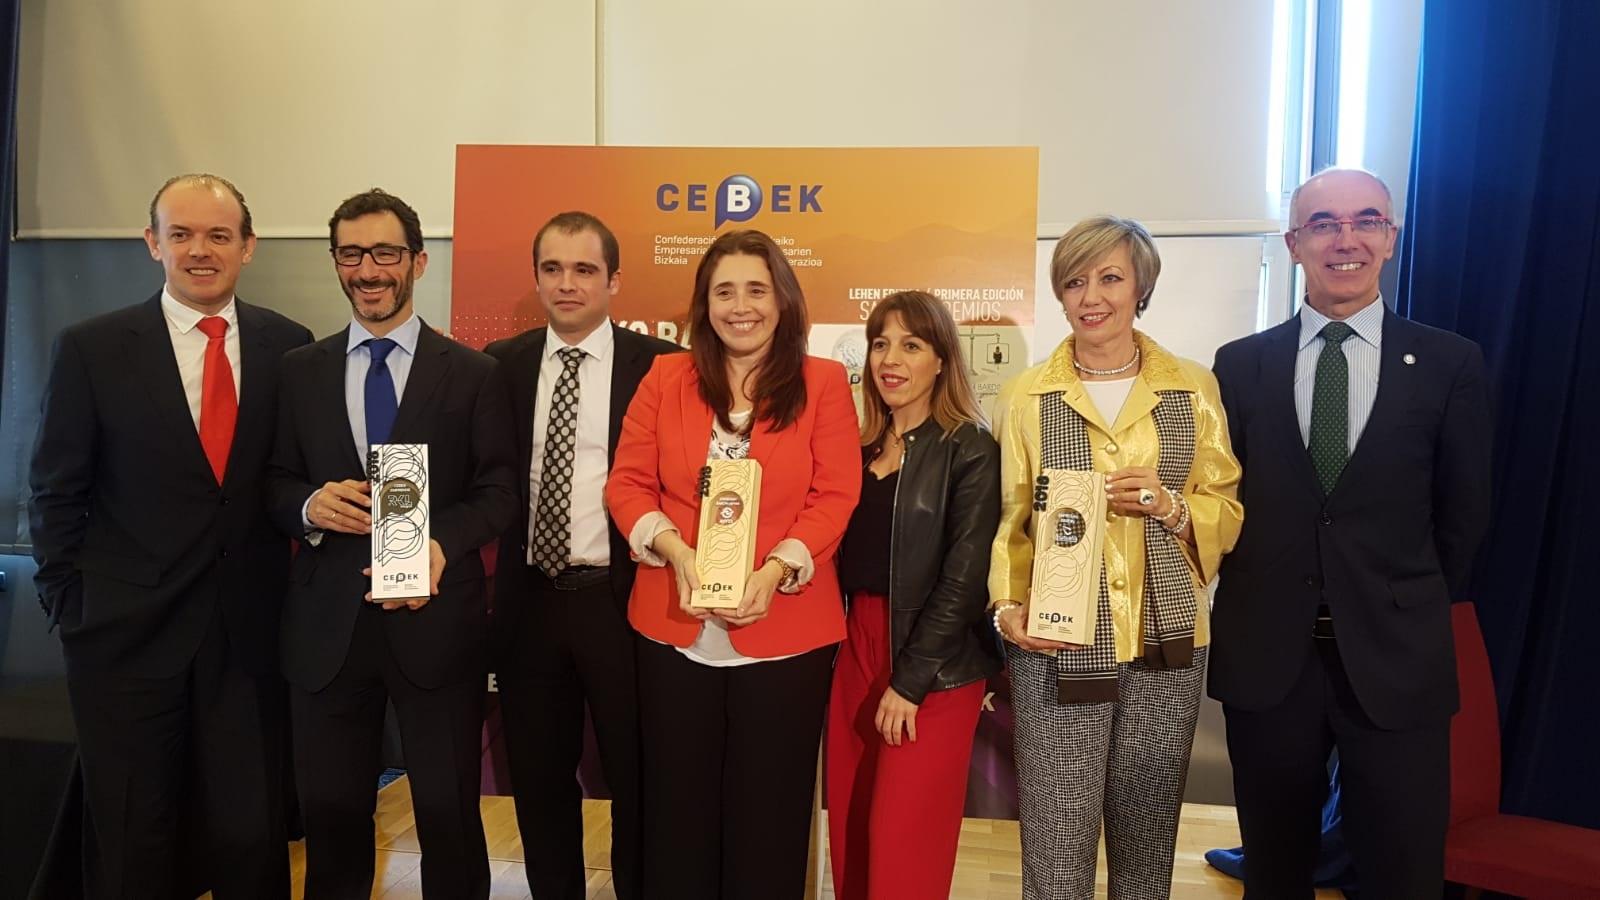 Premio Cebek